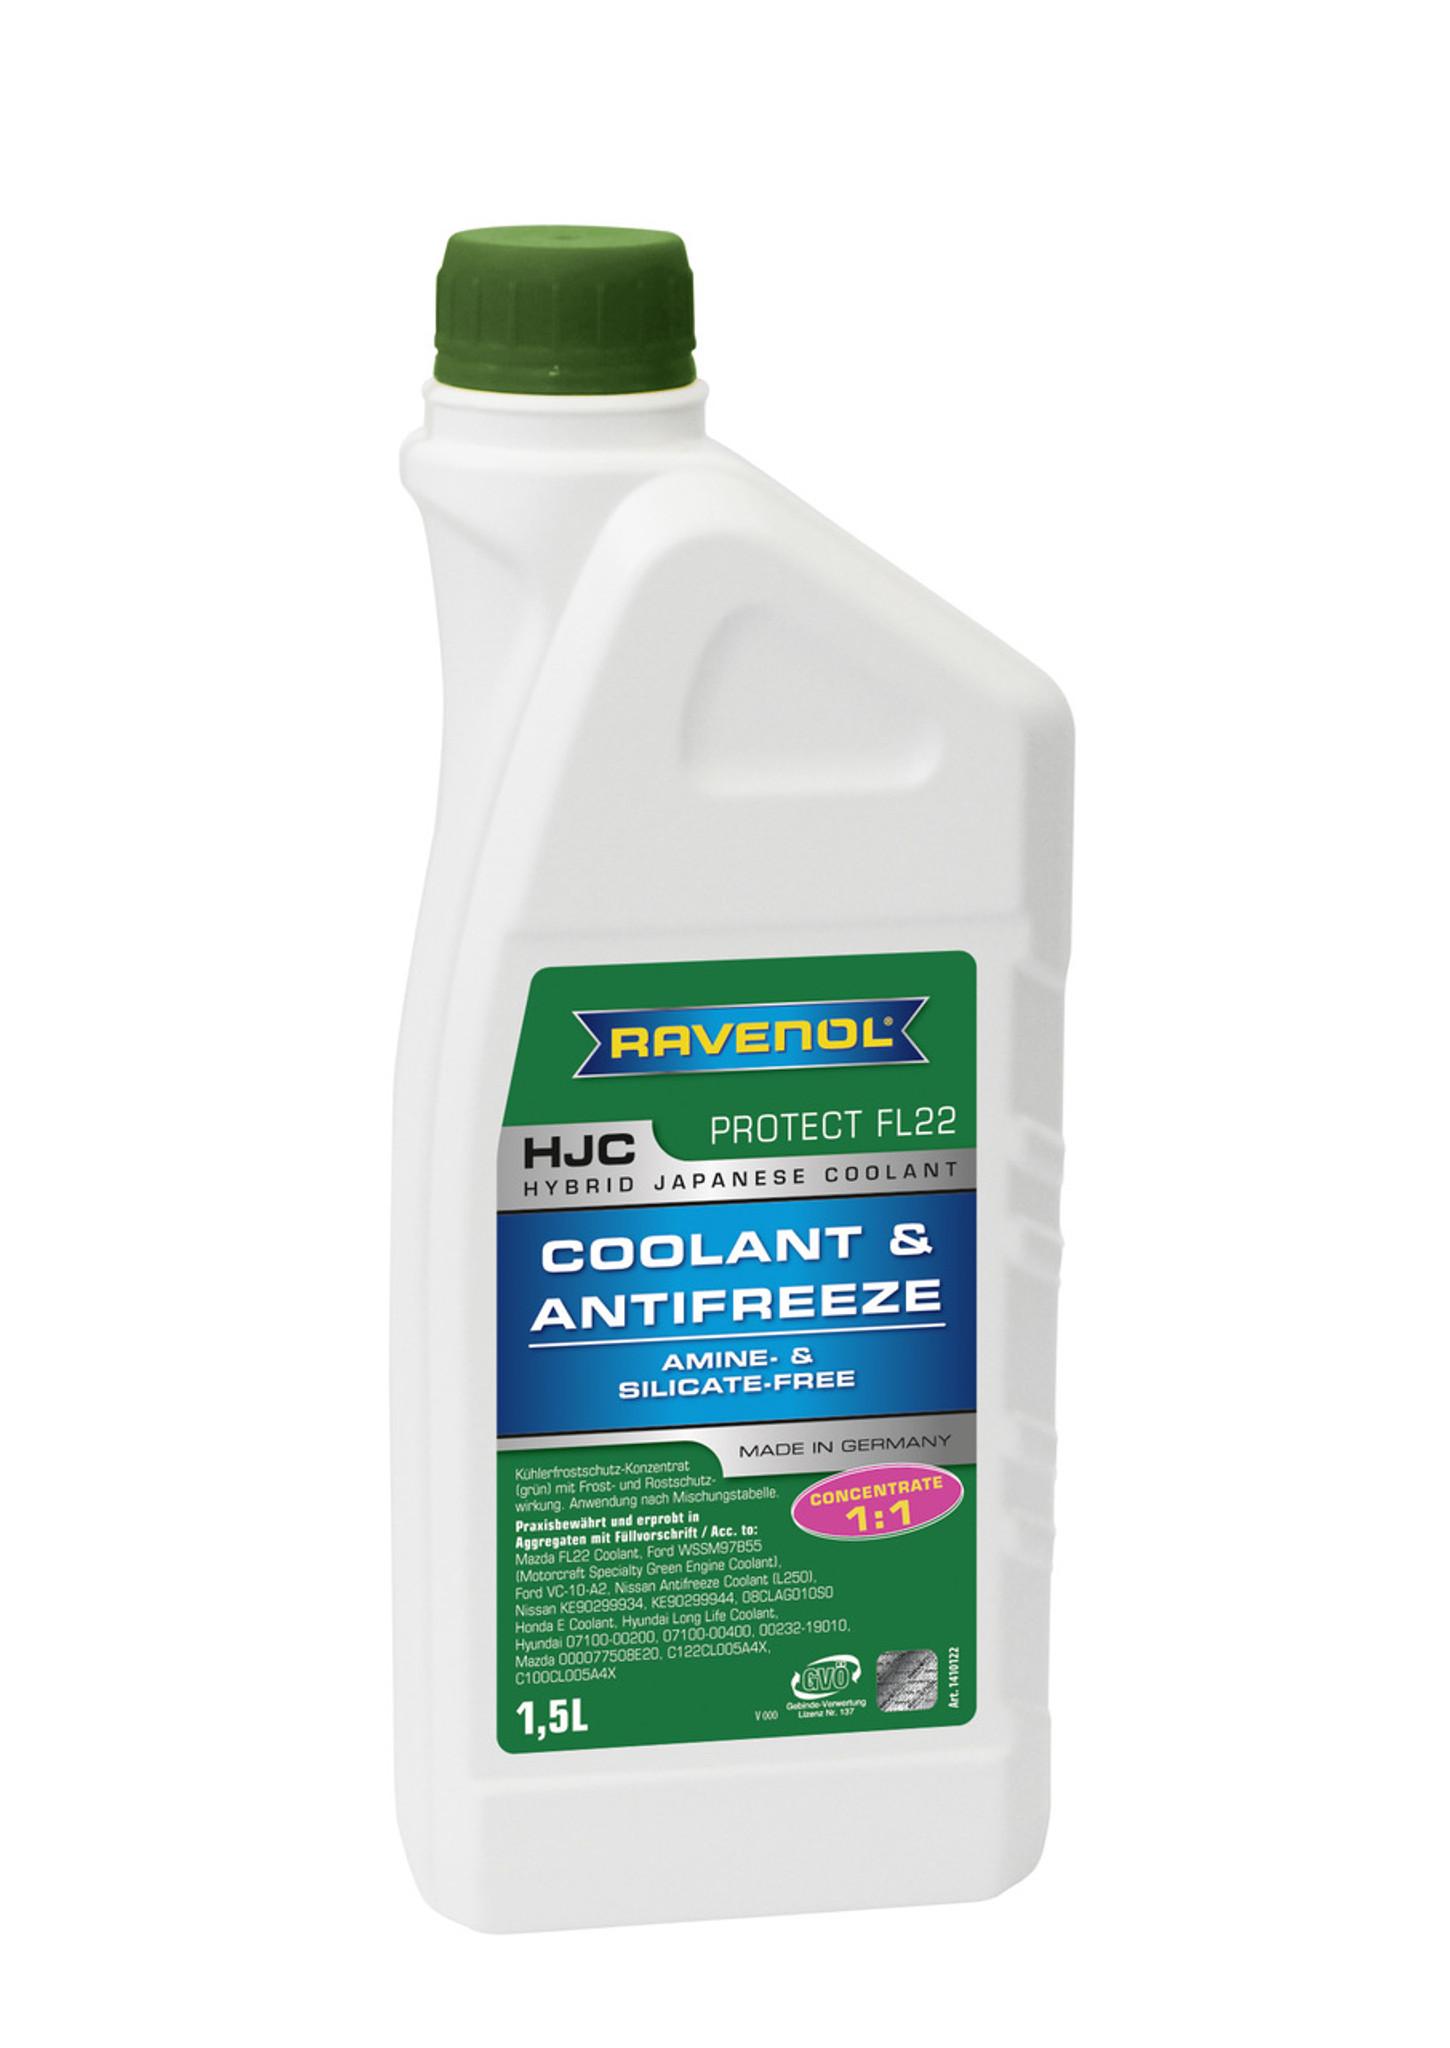 ... Antifreeze - RAVENOL HJC - FL22 Concentrate